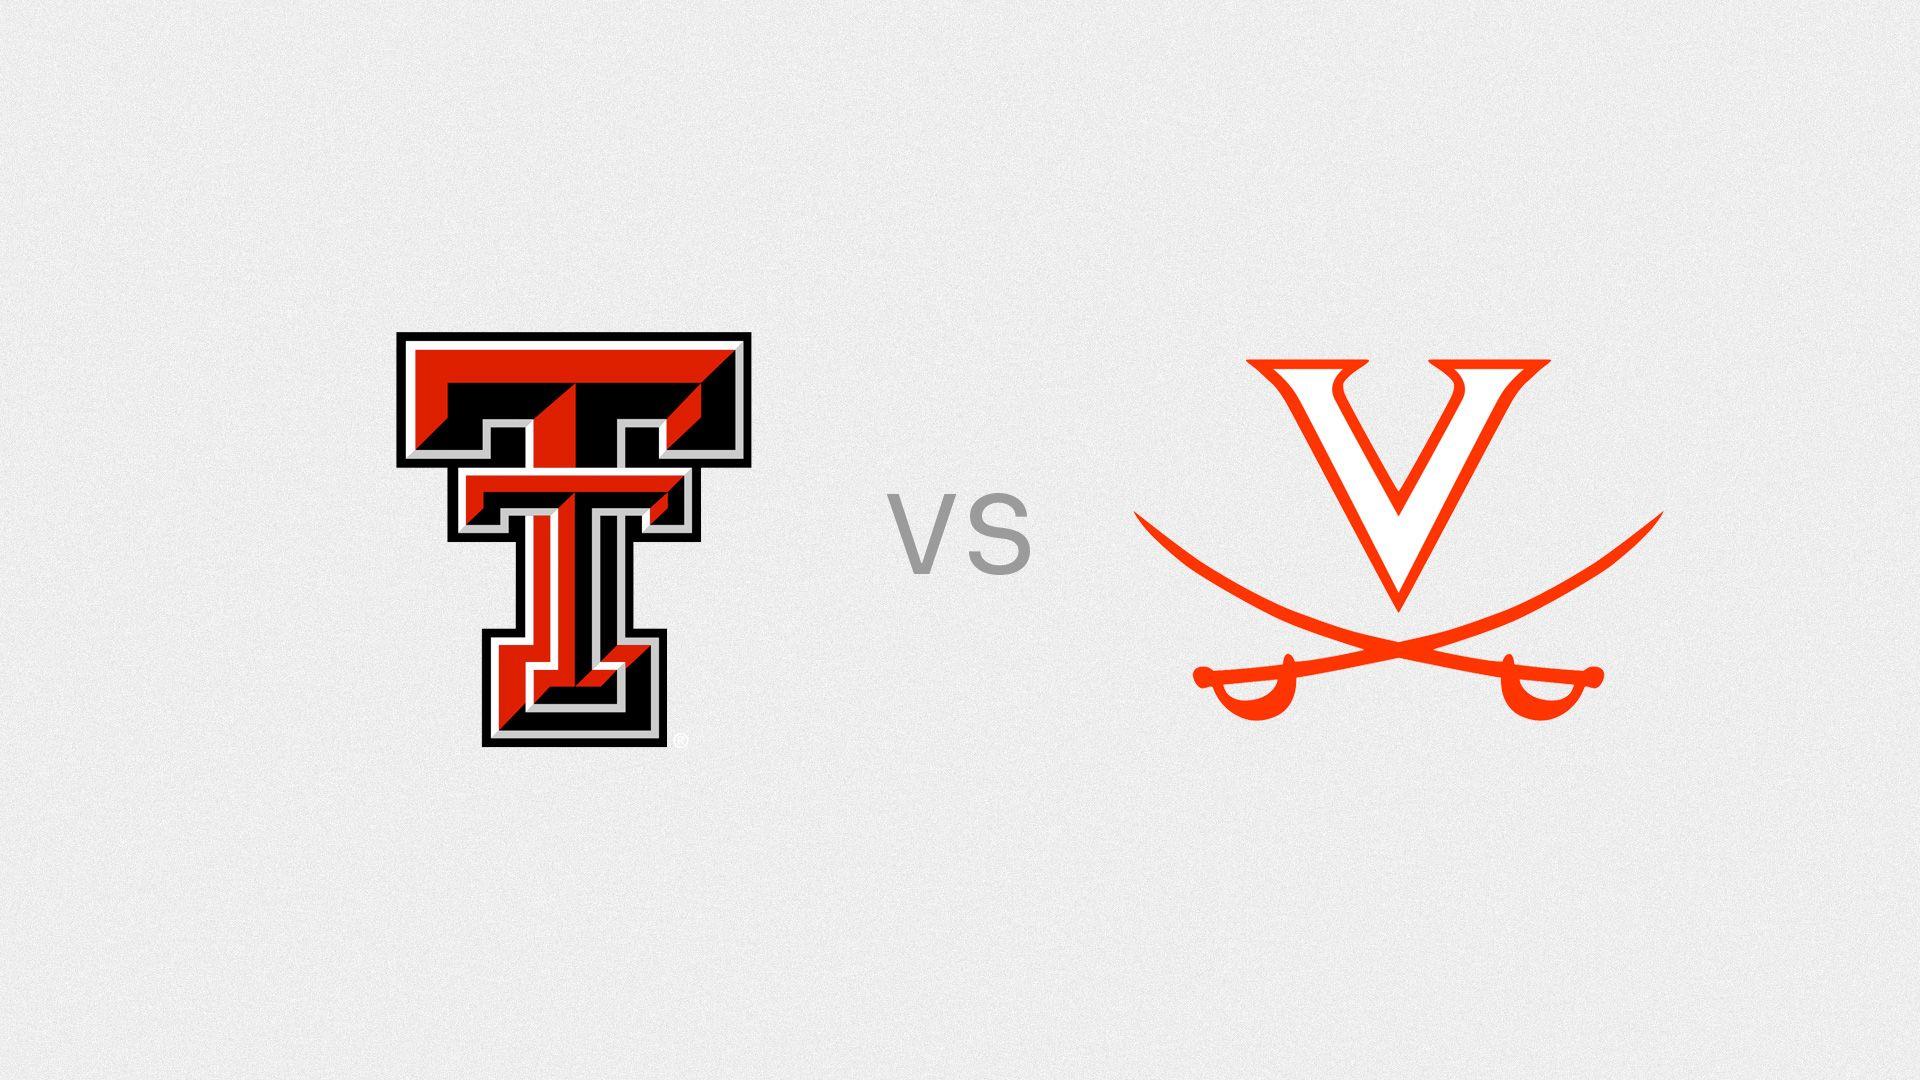 Texas Tech vs. UVA